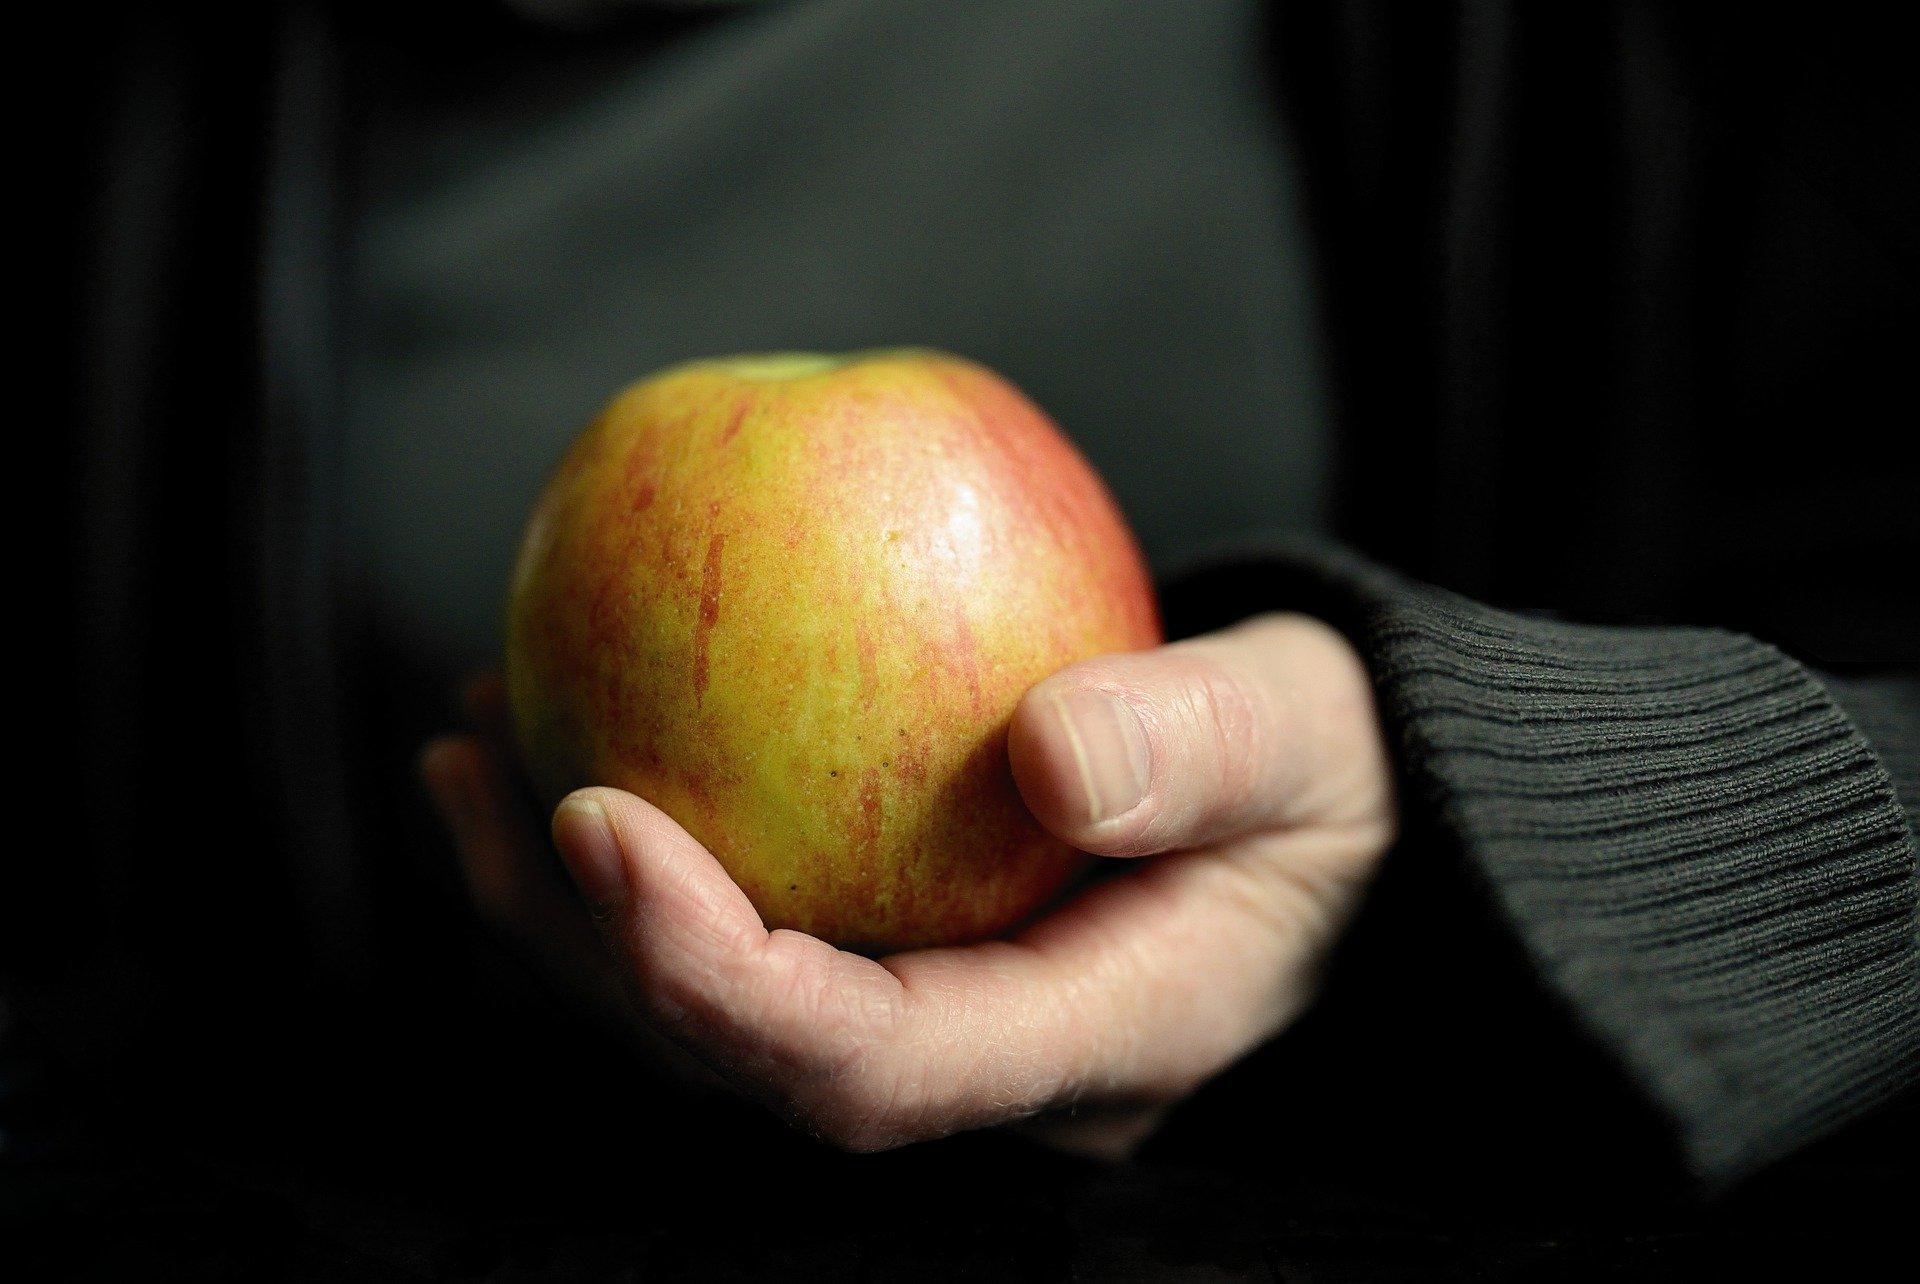 apple-5391076_1920